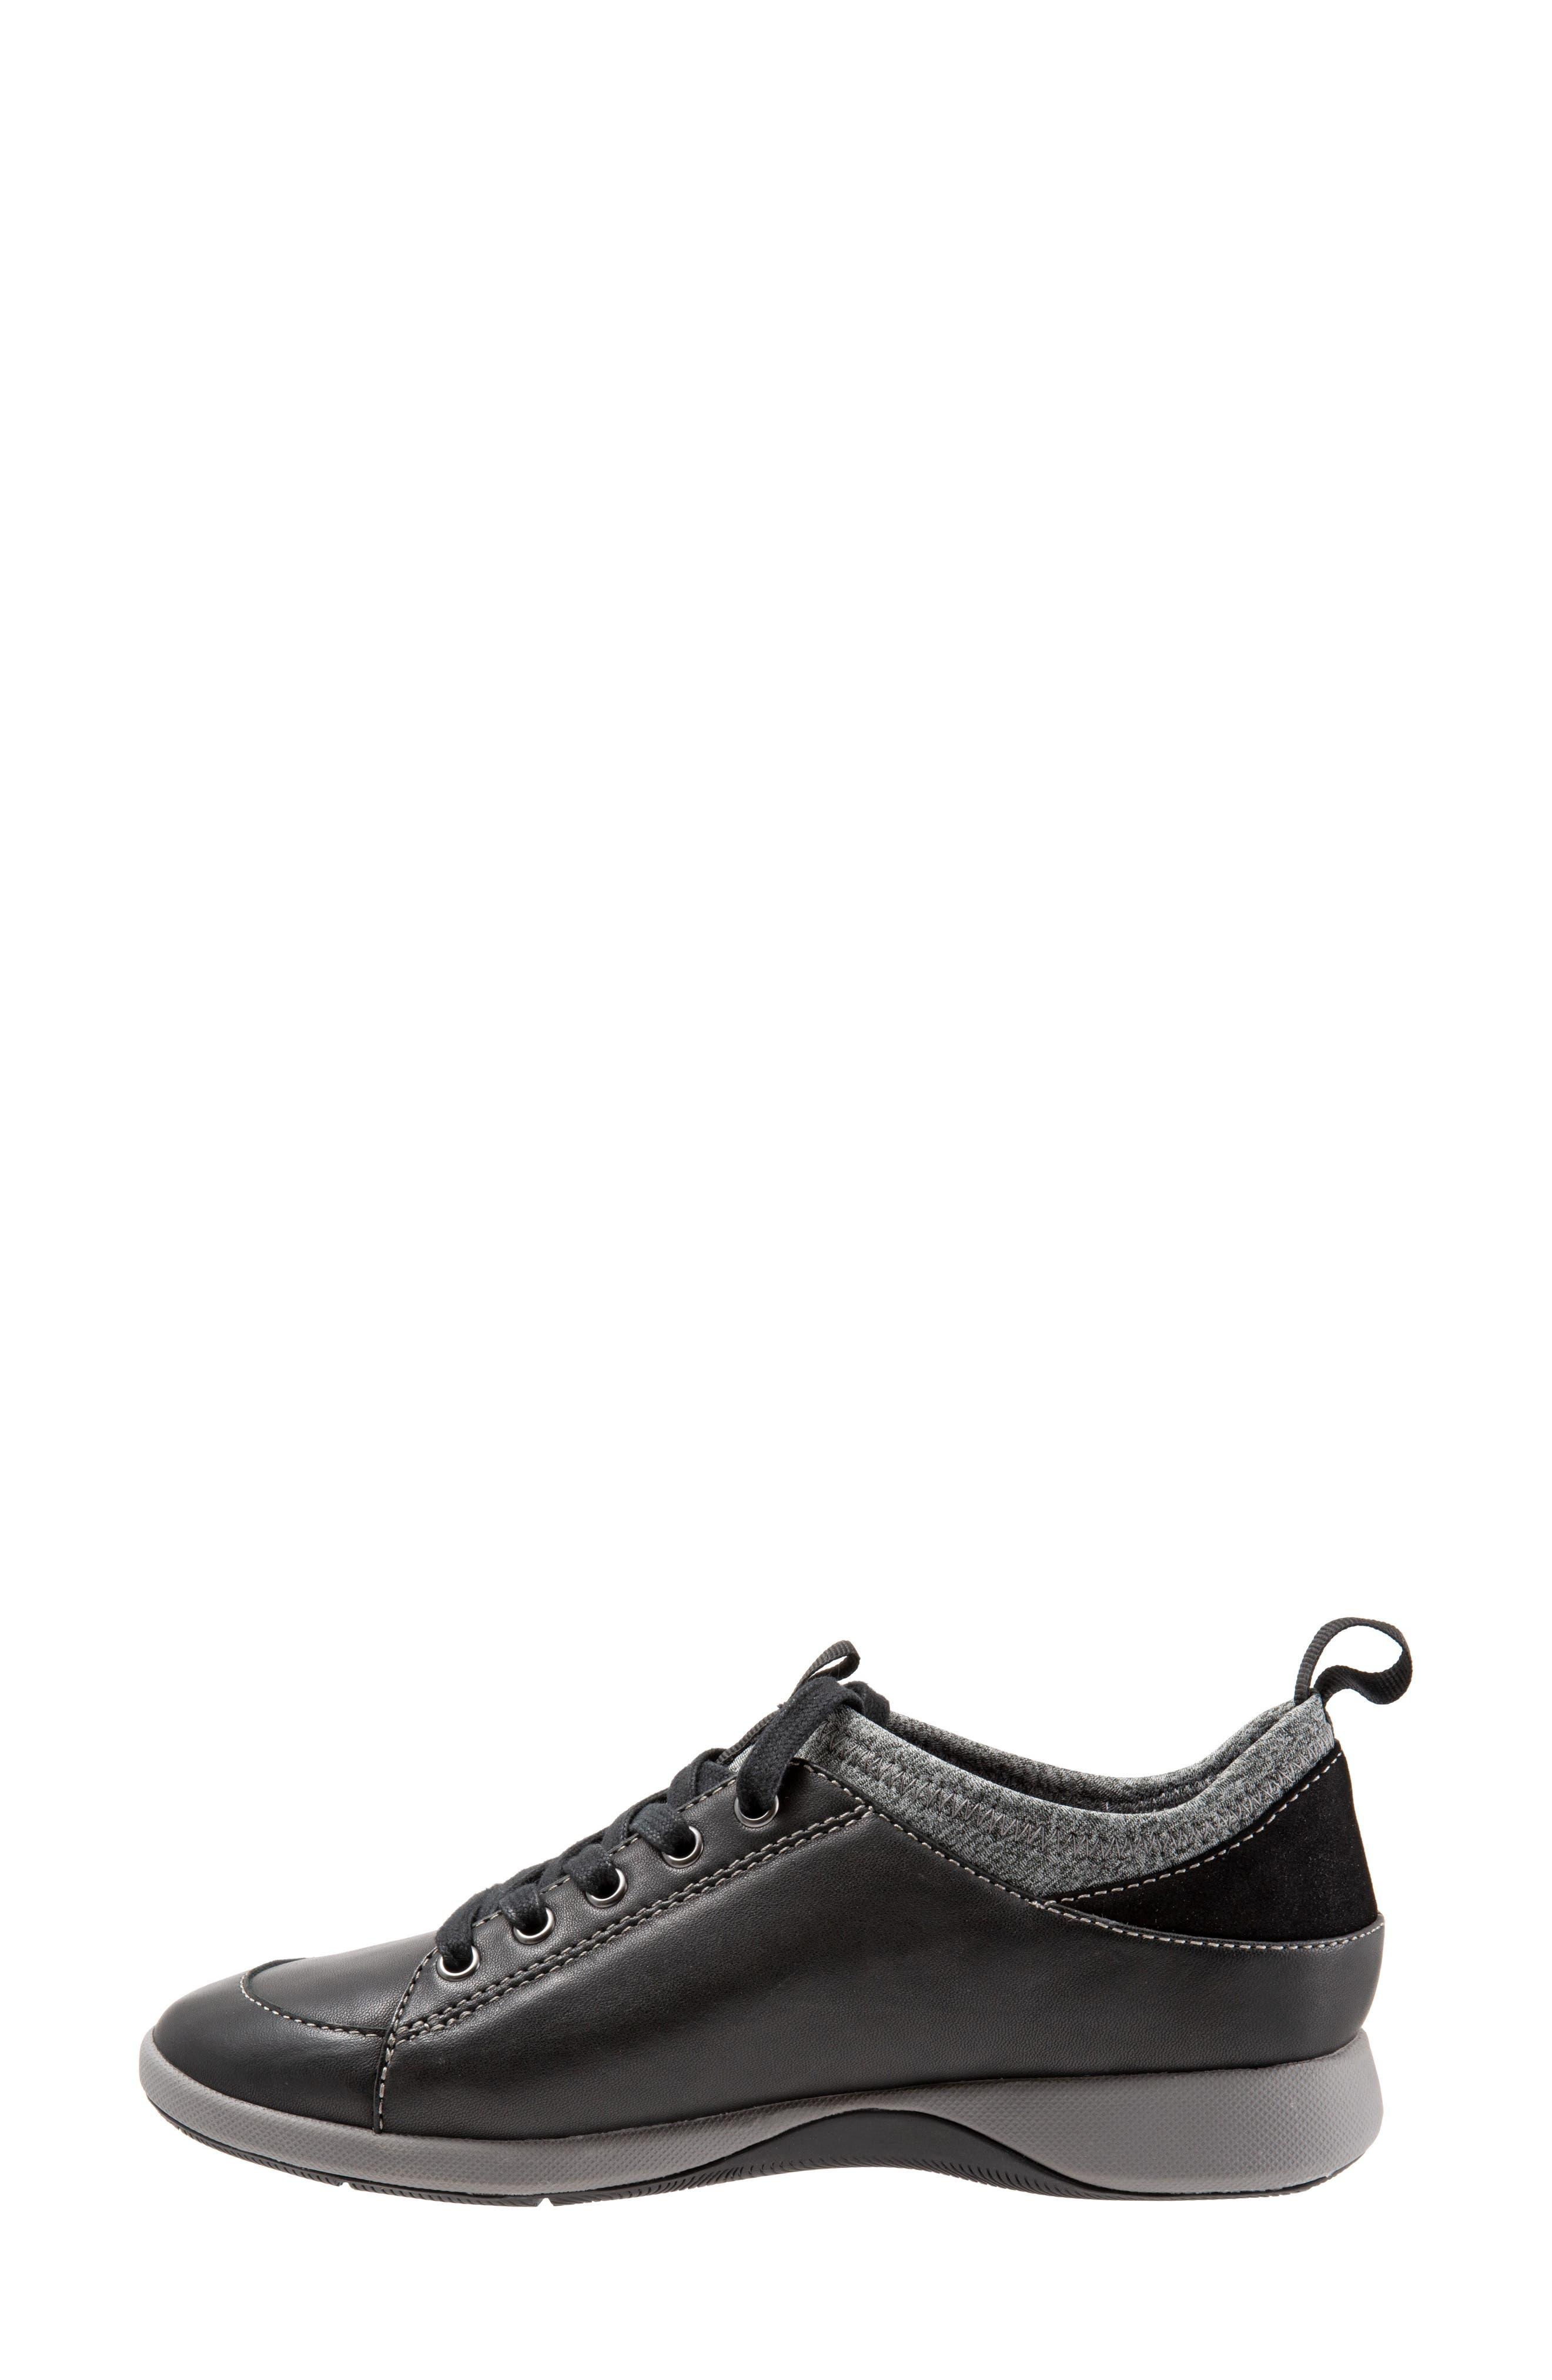 SOFTWALK<SUP>®</SUP>, SAVA Haven Sneaker, Alternate thumbnail 9, color, BLACK/ GREY LEATHER